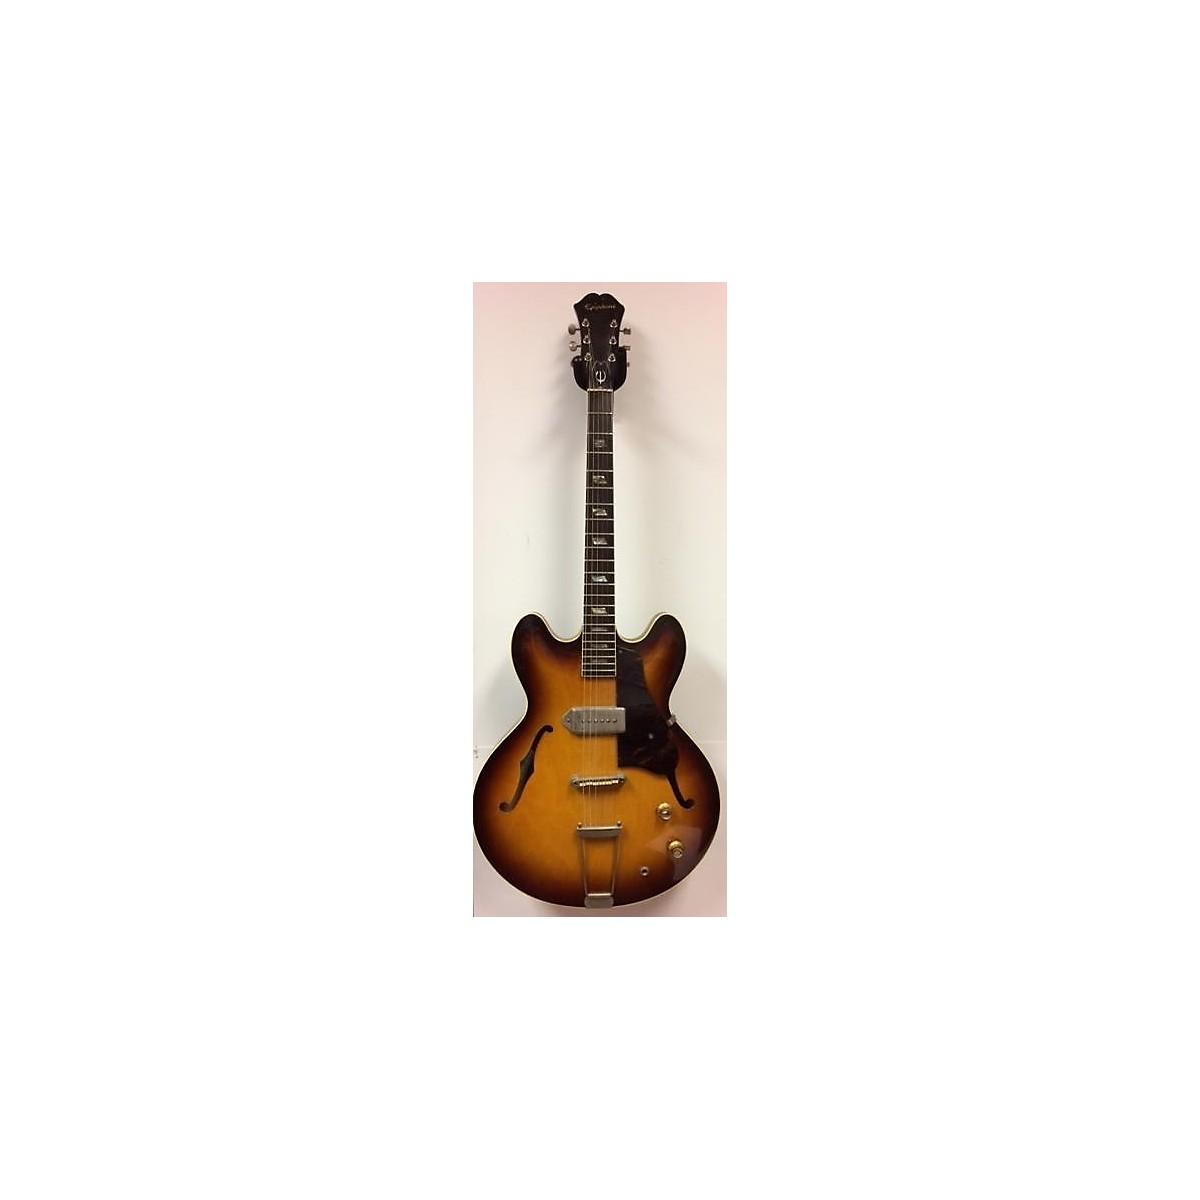 Epiphone 1964 Casino Hollow Body Electric Guitar